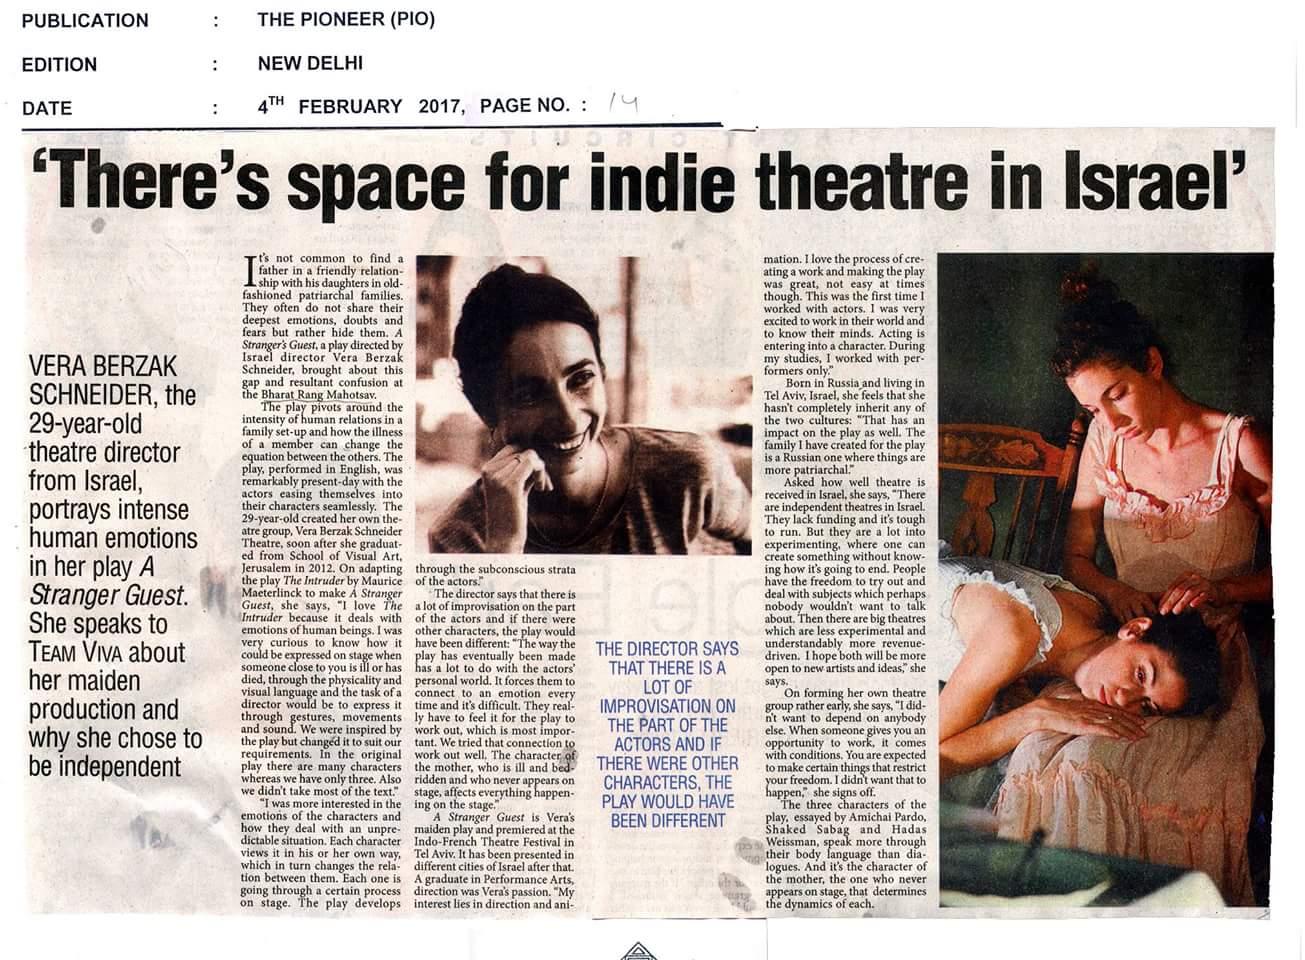 The Pioneer interview Delhi